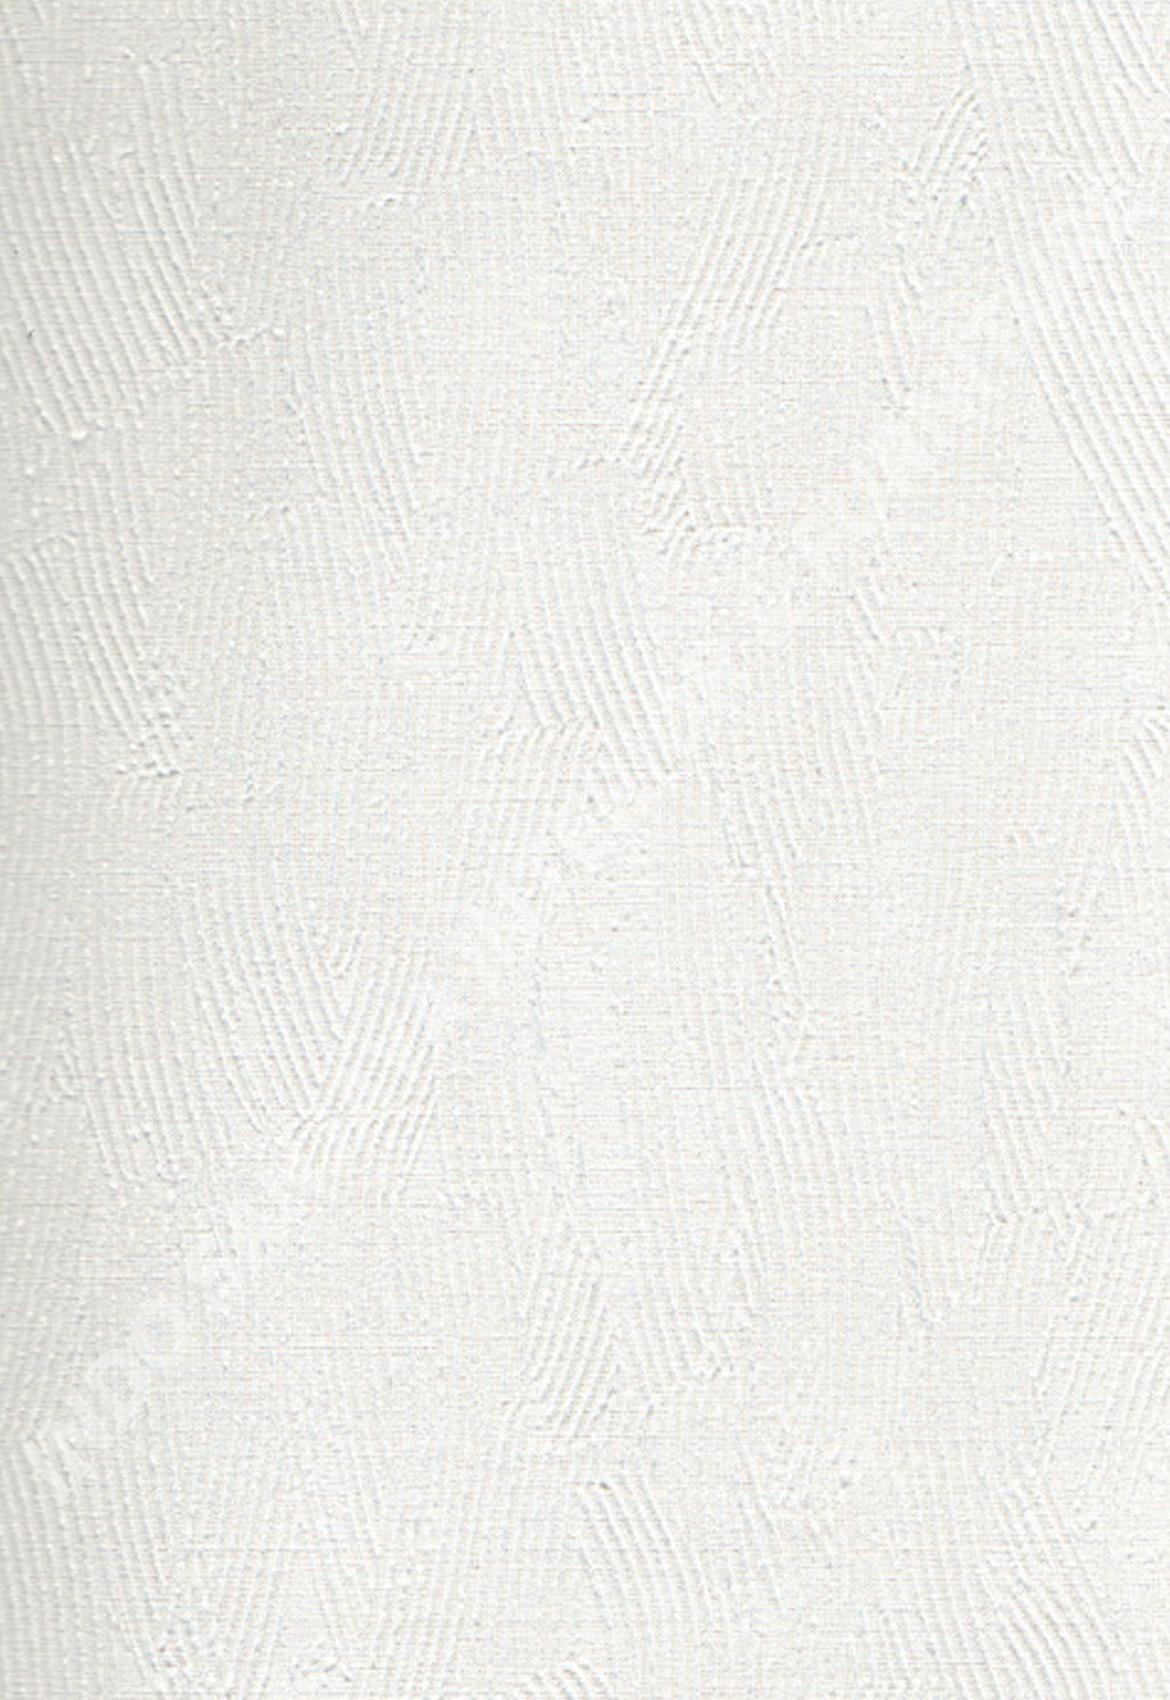 wallpaper   Wallpaper Minimalis Polos 8805:8805 corak  warna